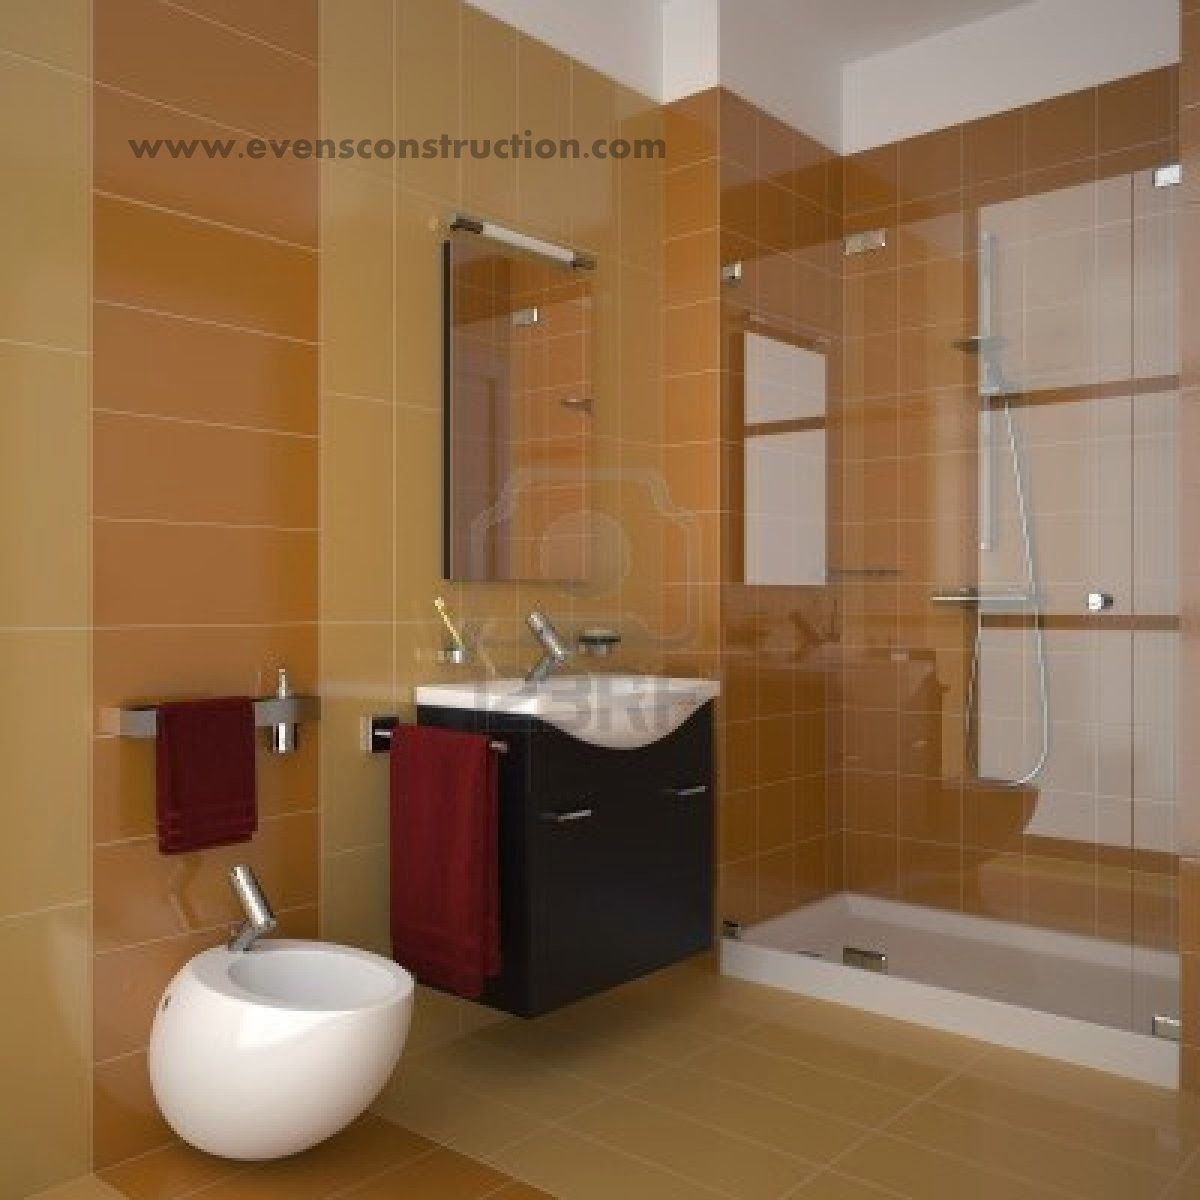 Kerala House Plans Kerala House Designs Kerala Interior Designs Kerala Villa Designs Kerala Home Design Bathrooms Remodel Trendy Bathroom Half Bathroom Remodel